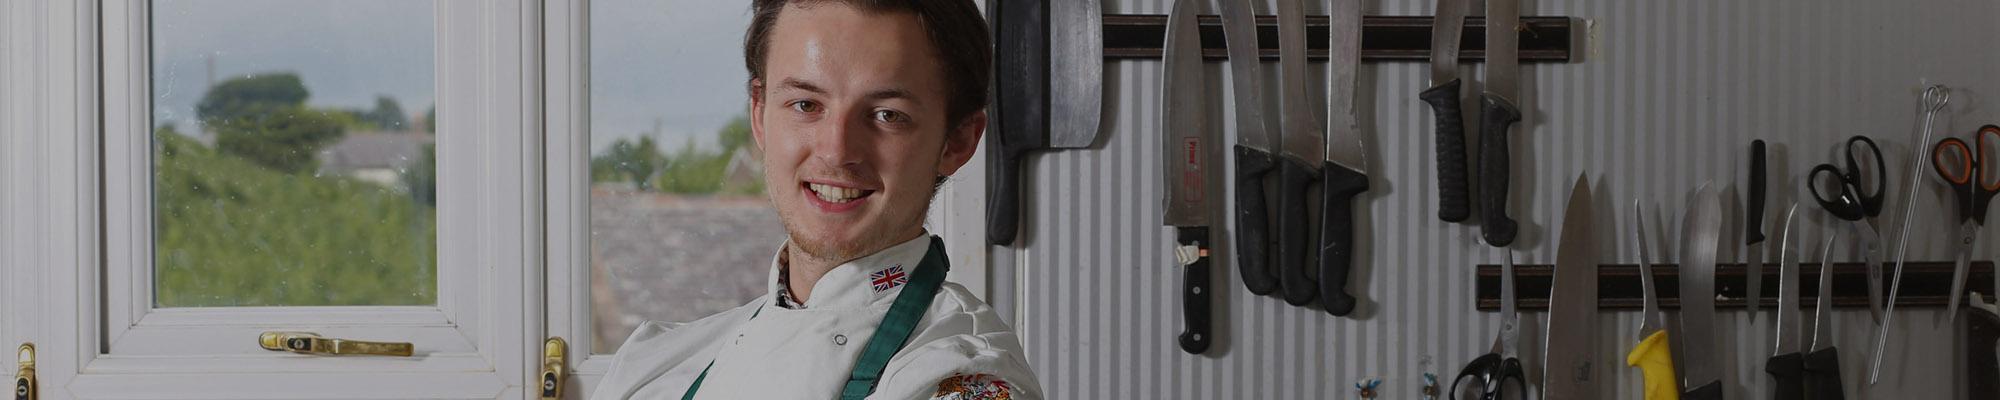 Peter Rushforth Apprenticeships Butchery Worldskills Training Provider Arwyn Watkins Cambrian Training Apprenticeships Training Provider Wales Welsh